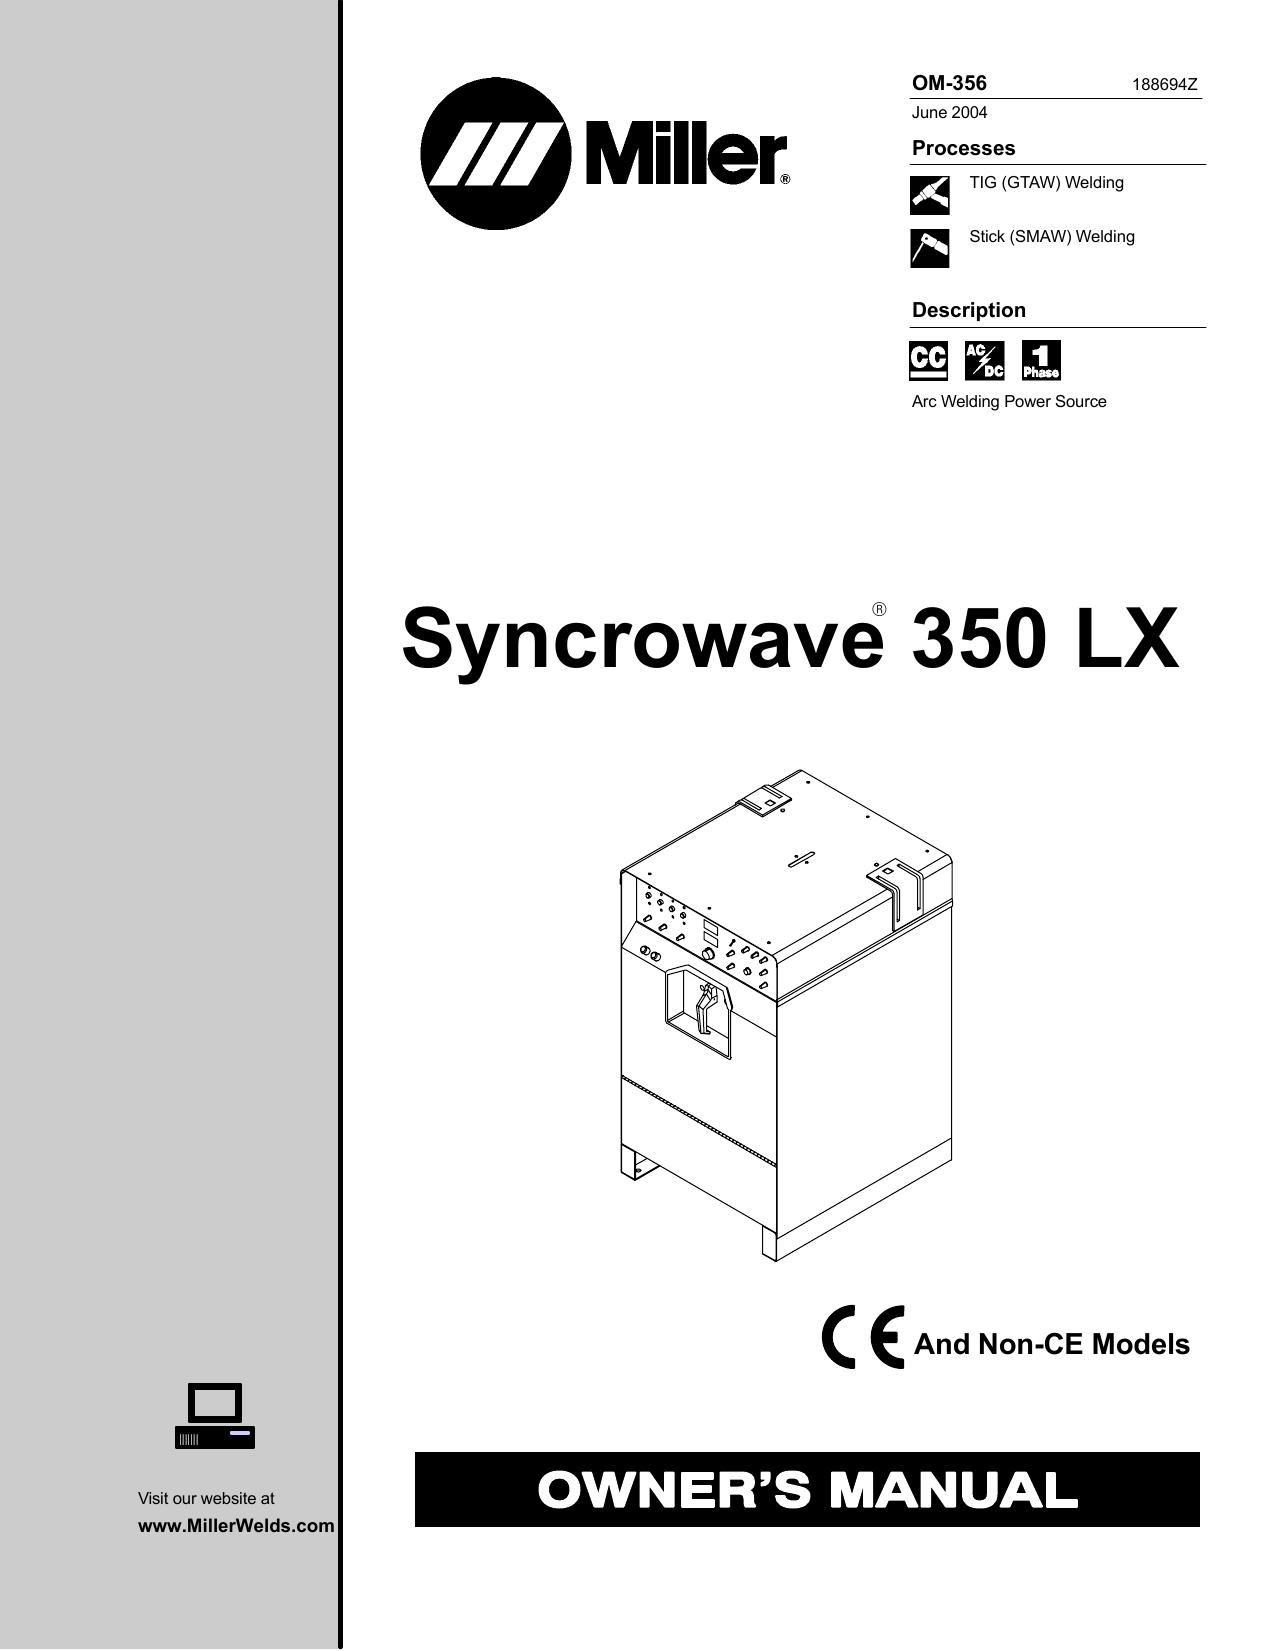 miller syncrowave 350 lx owner`s manual